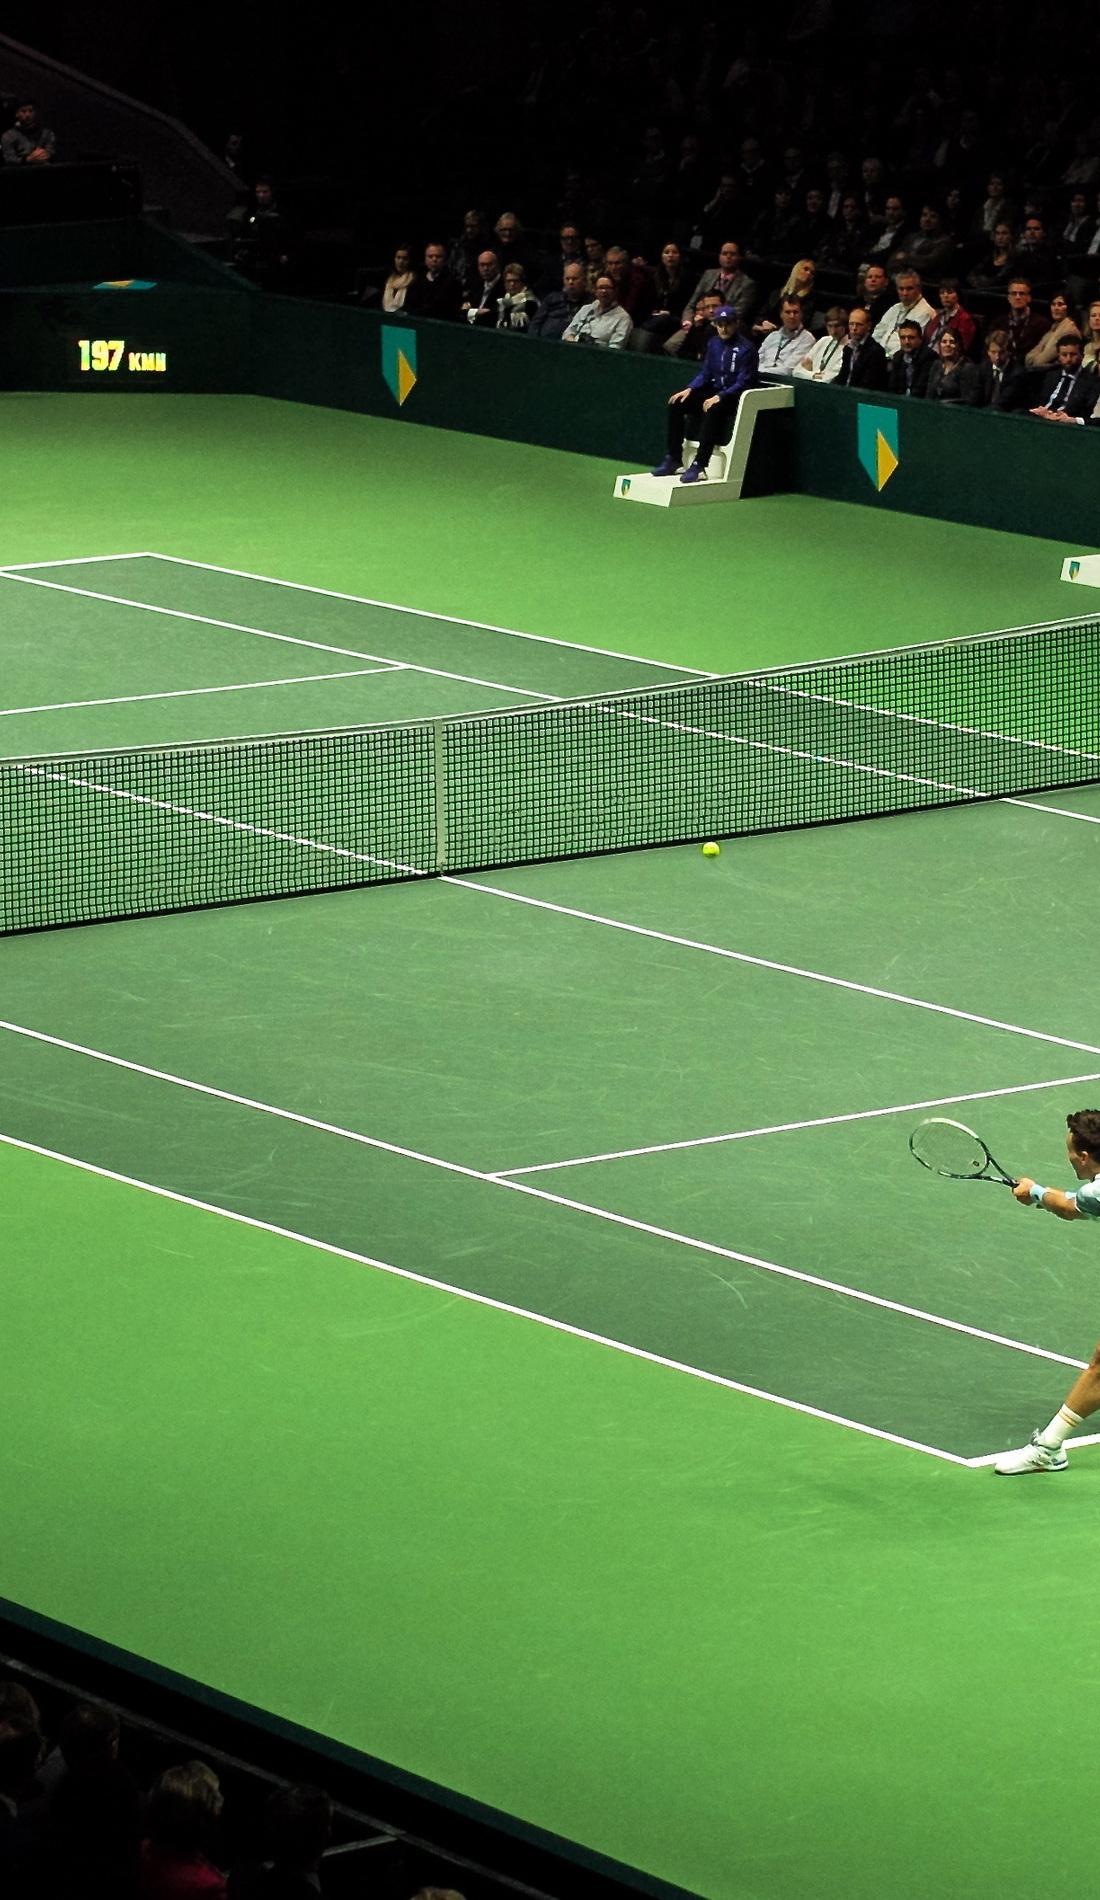 A Delray Beach International Tennis Championship live event